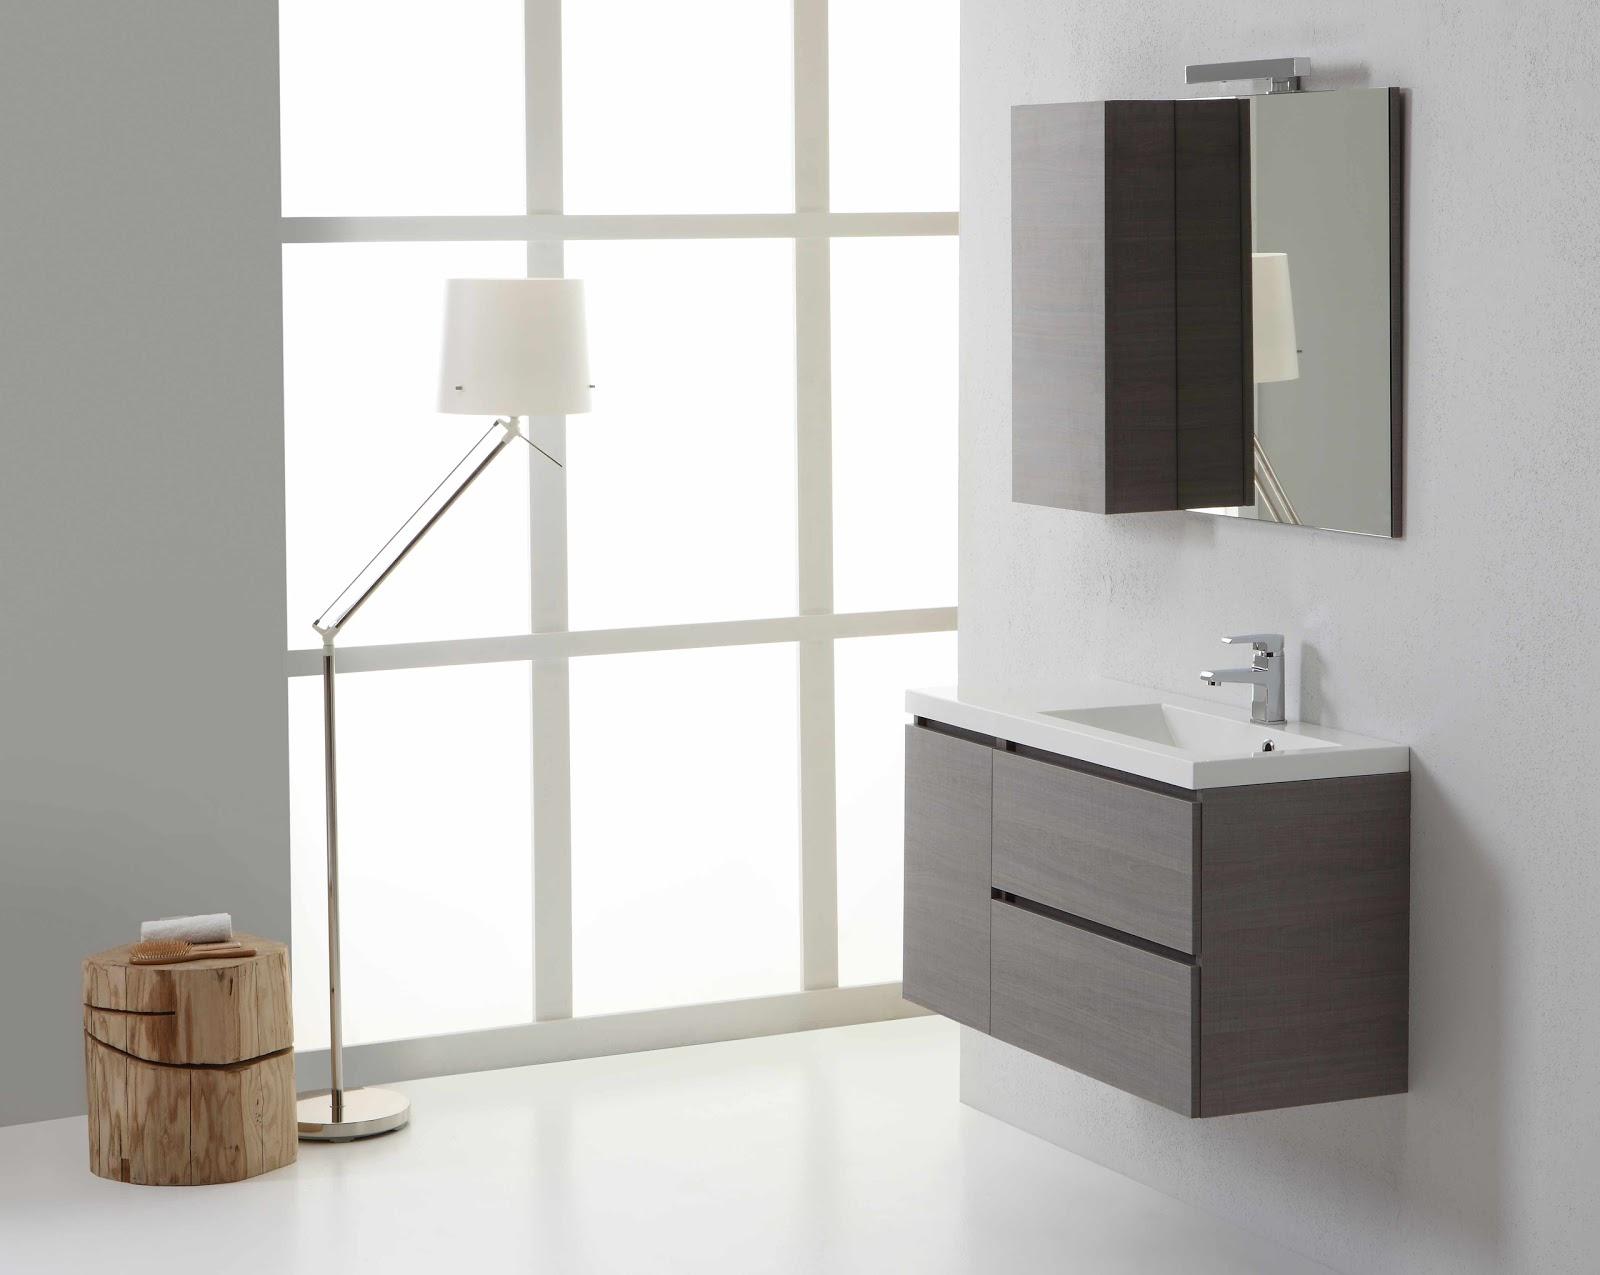 Corriere del web mobili bagno moderni kv store - Mobili x bagno moderni ...